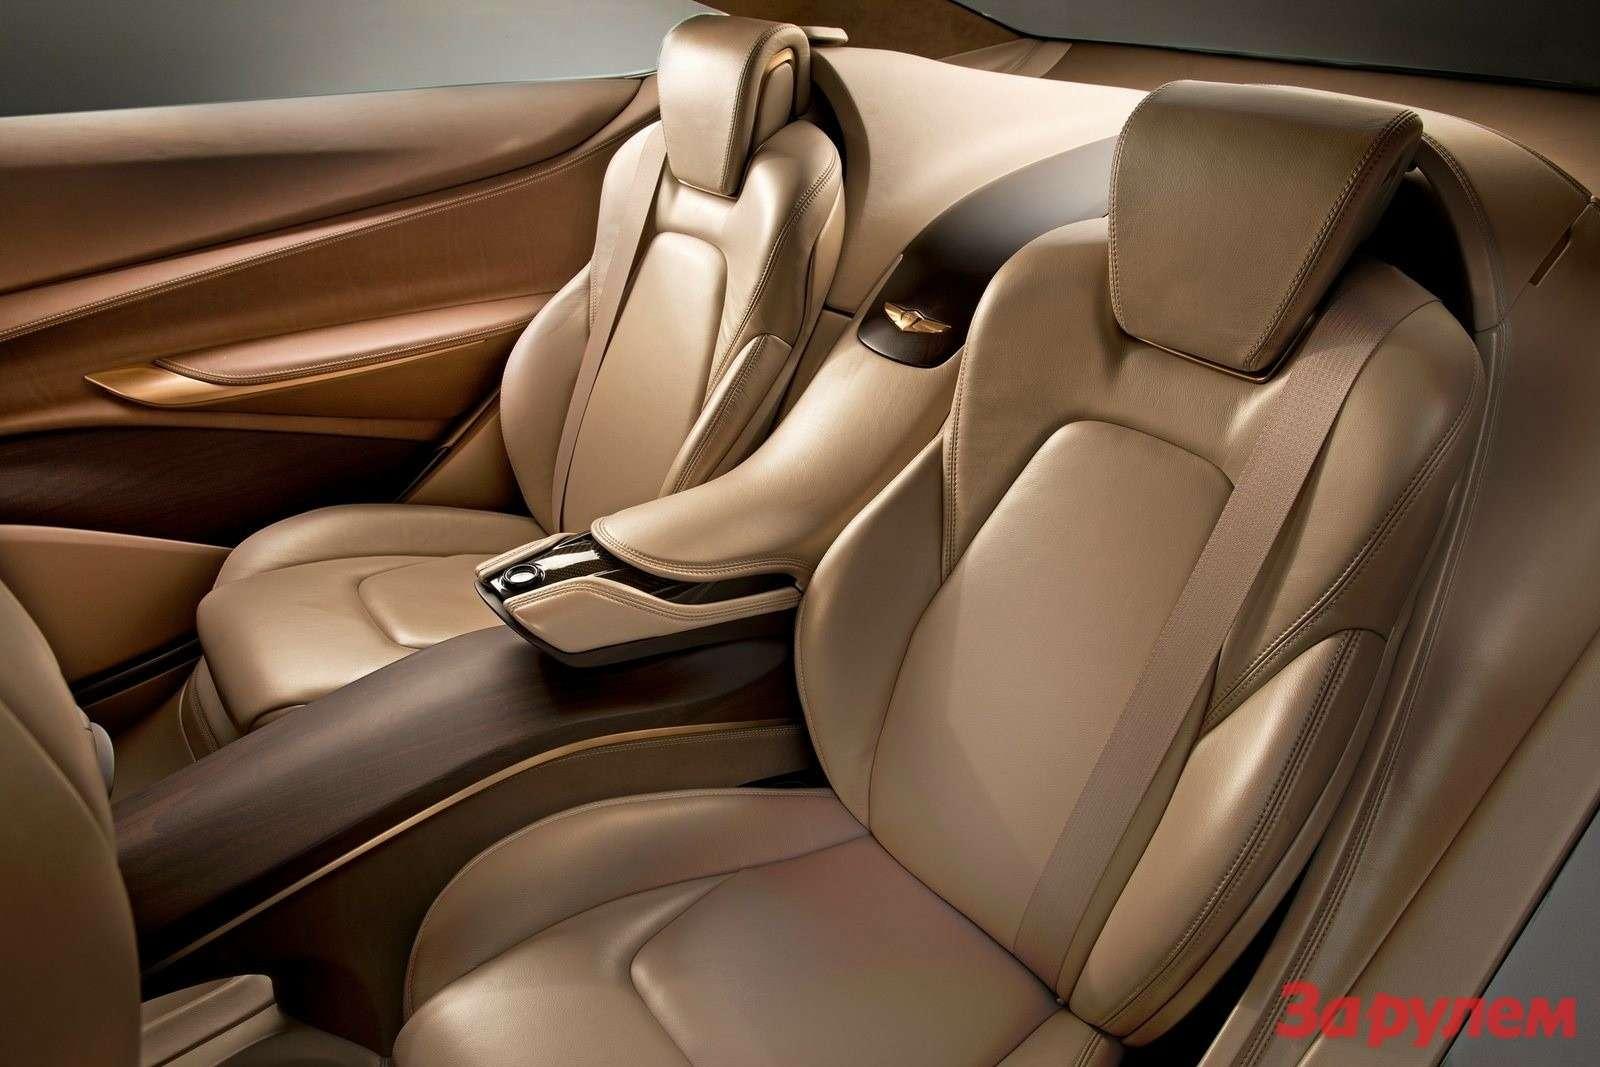 Hyundai-HCD-14_Genesis_Concept_2013_1600x1200_wallpaper_08